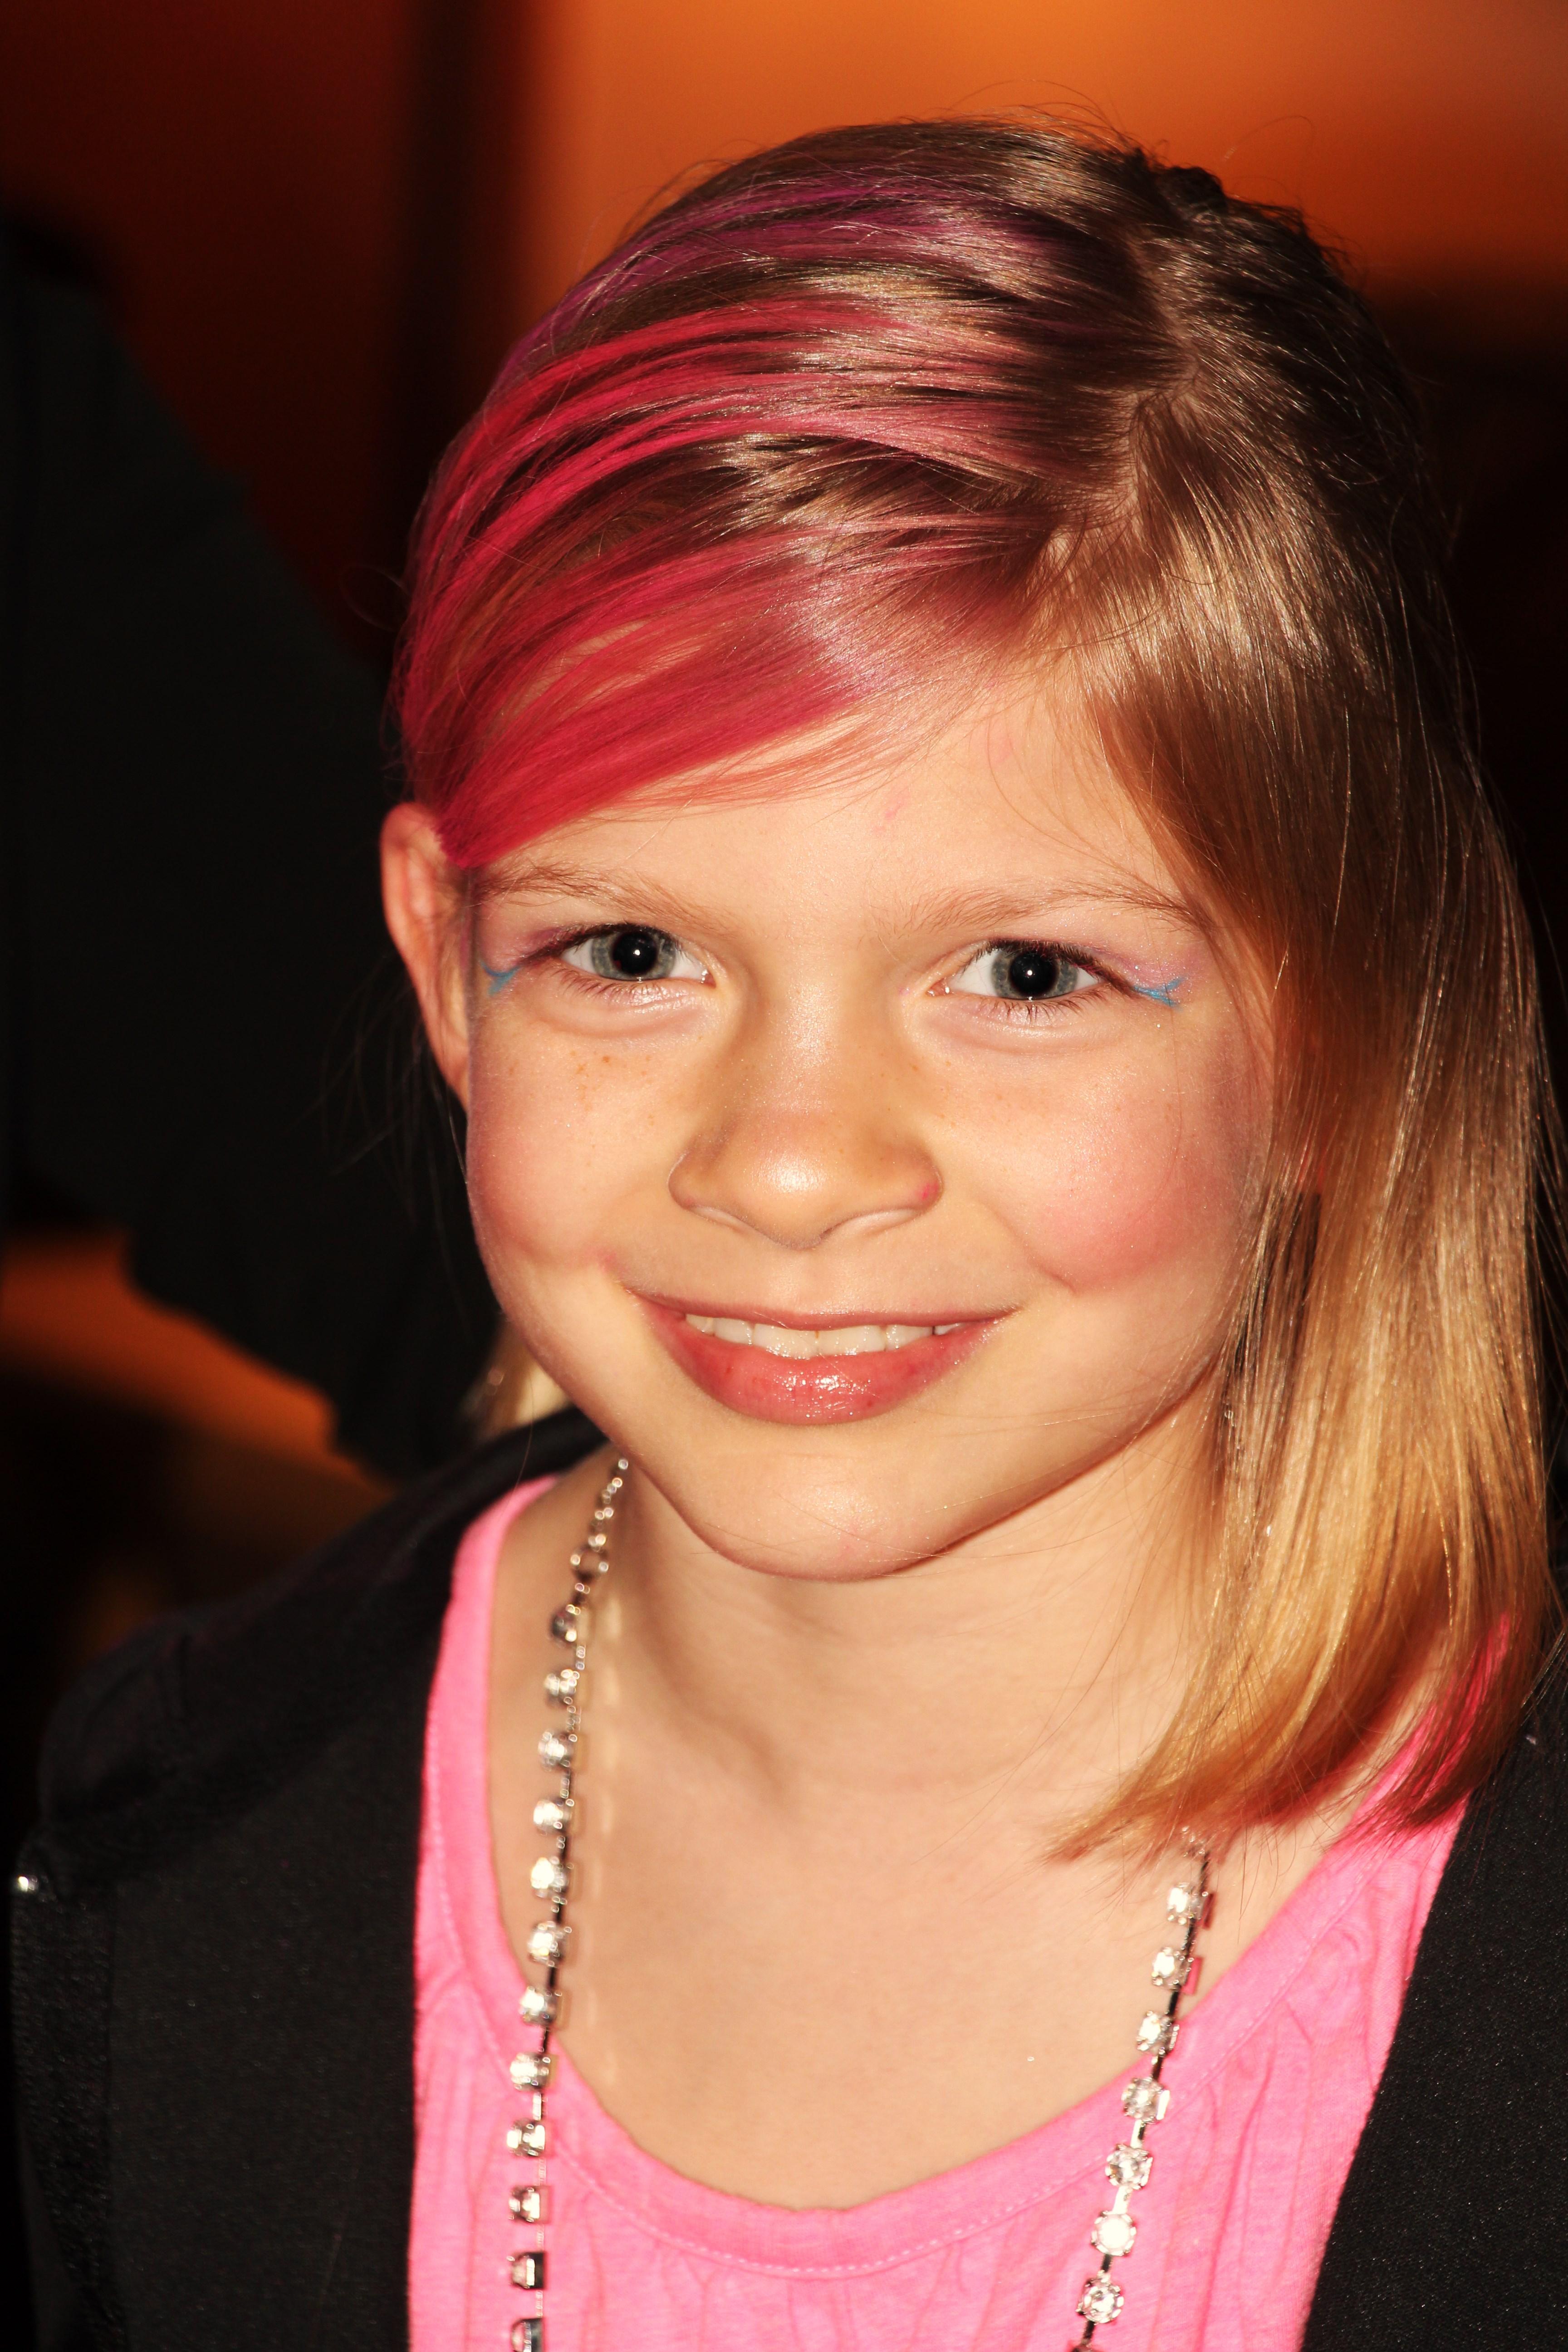 Isabella S 8th Birthday